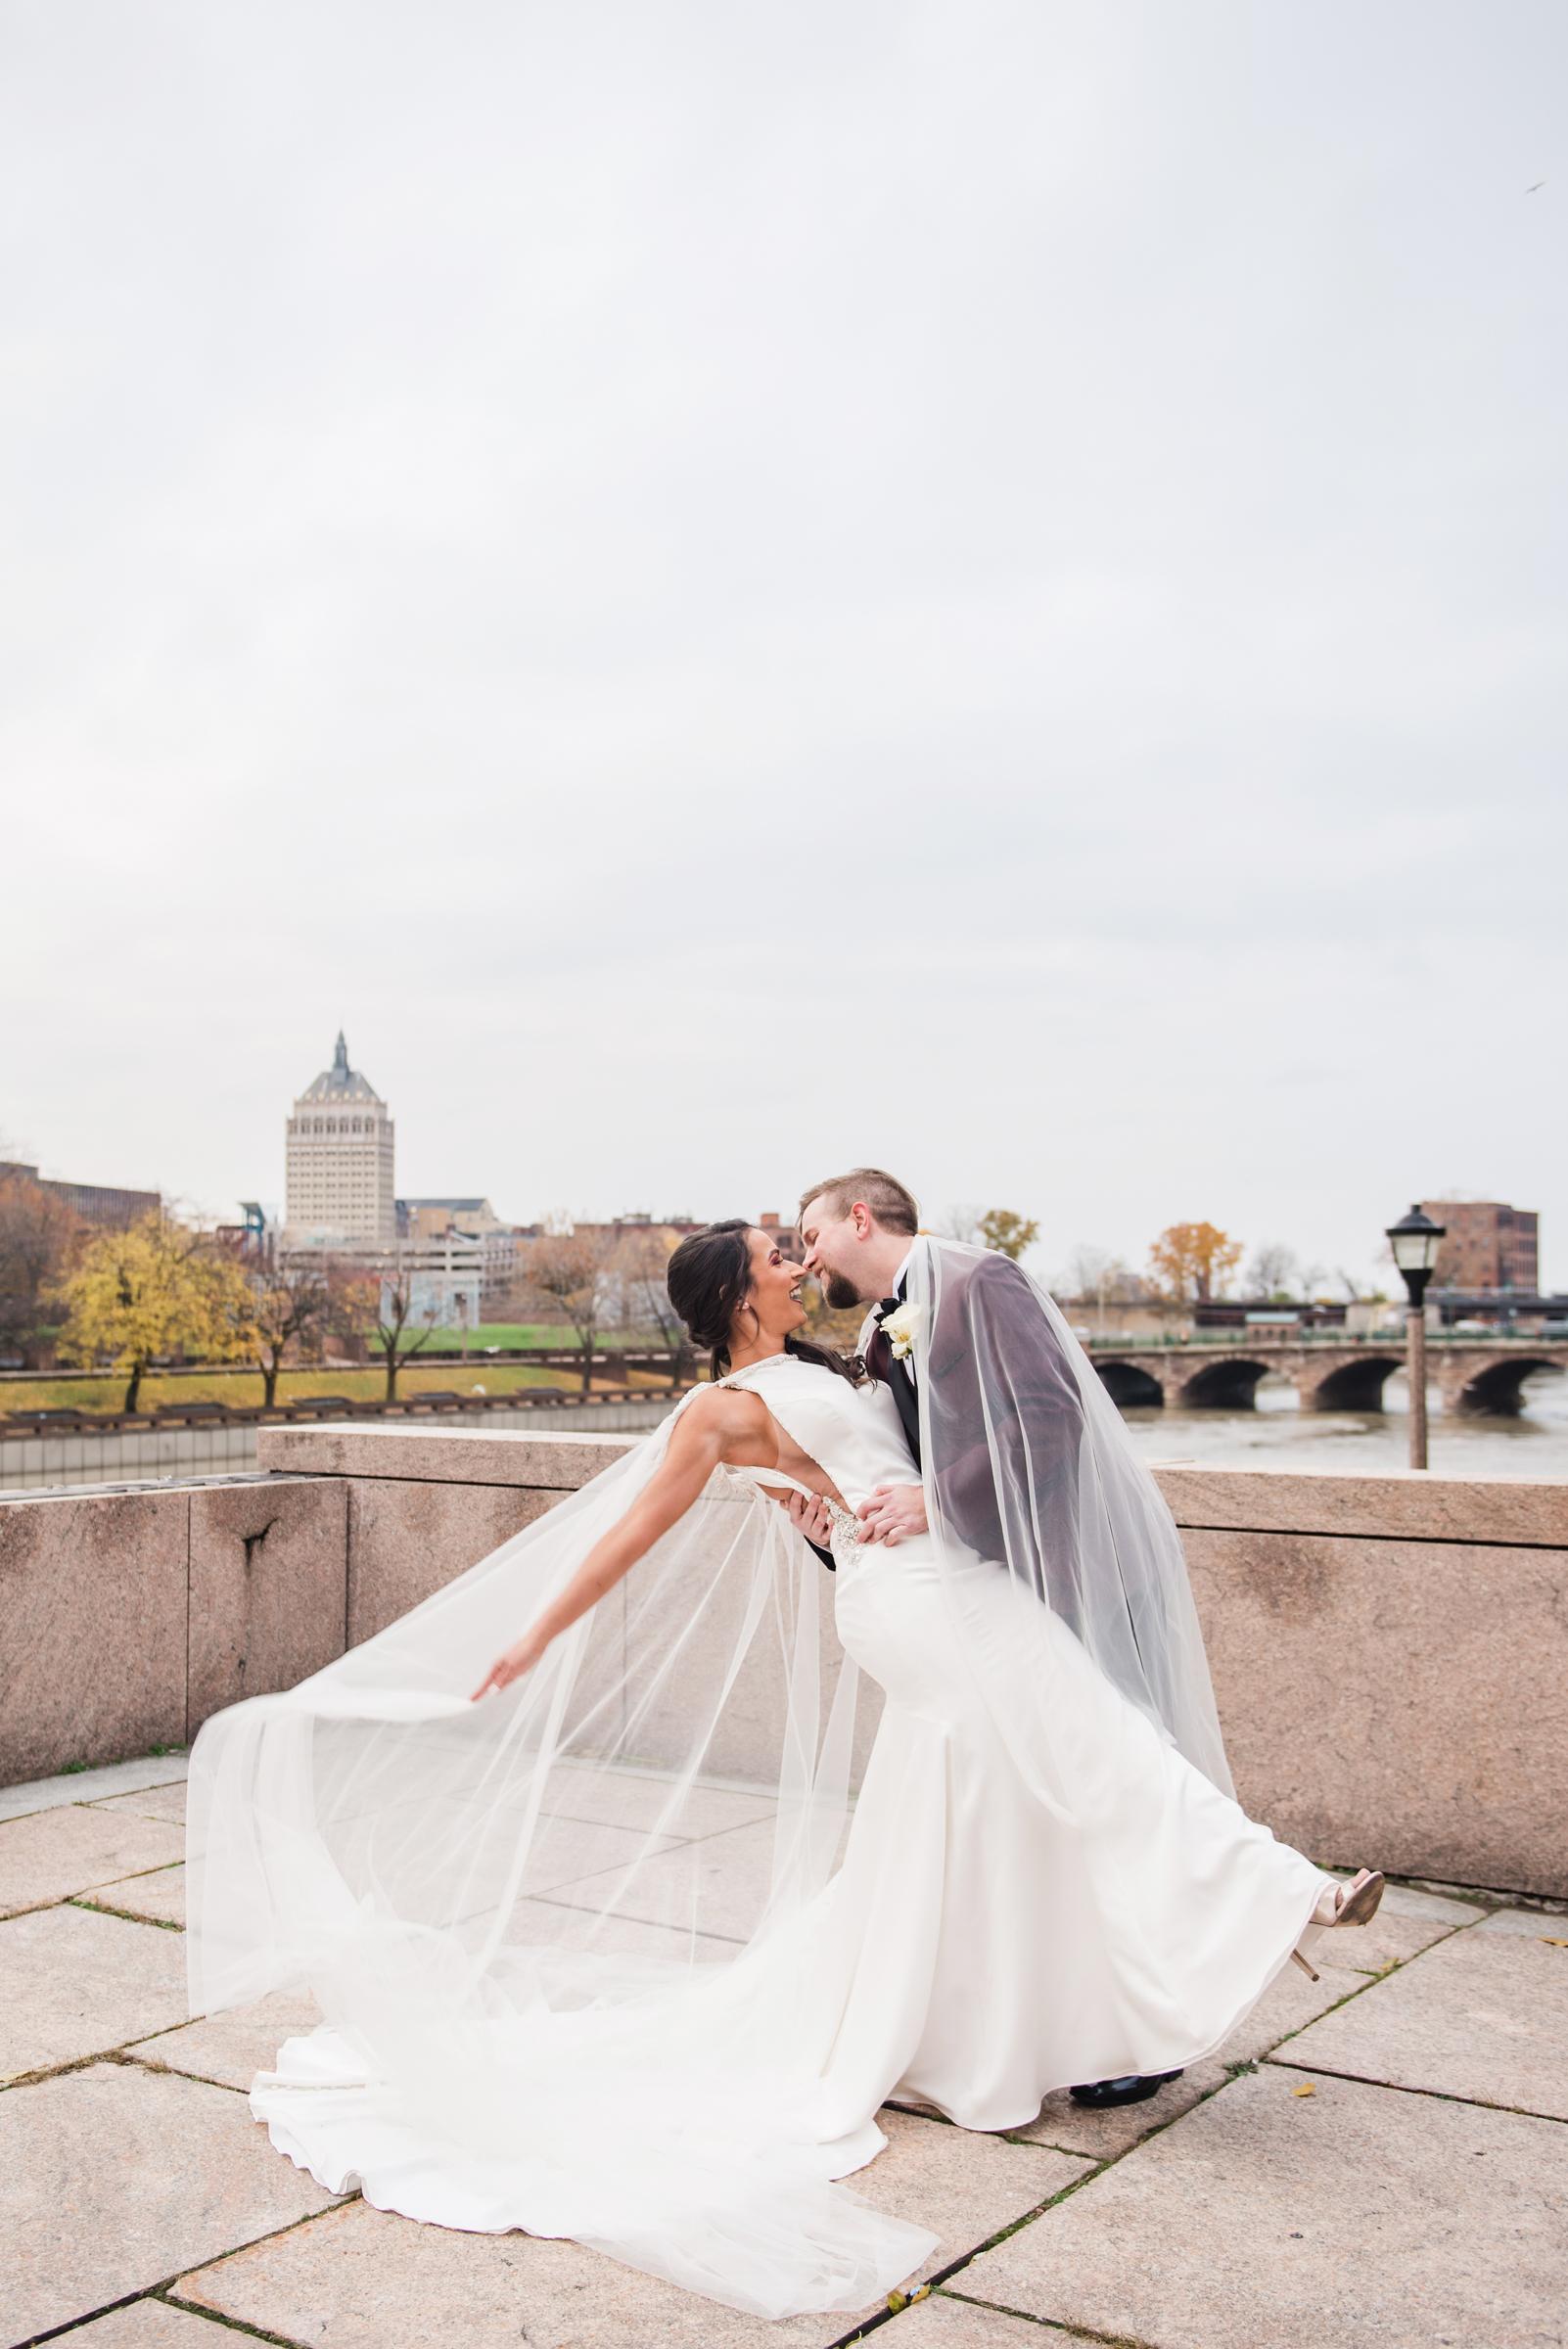 Wintergarden_by_Monroes_Rochester_Wedding_JILL_STUDIO_Rochester_NY_Photographer_163748.jpg